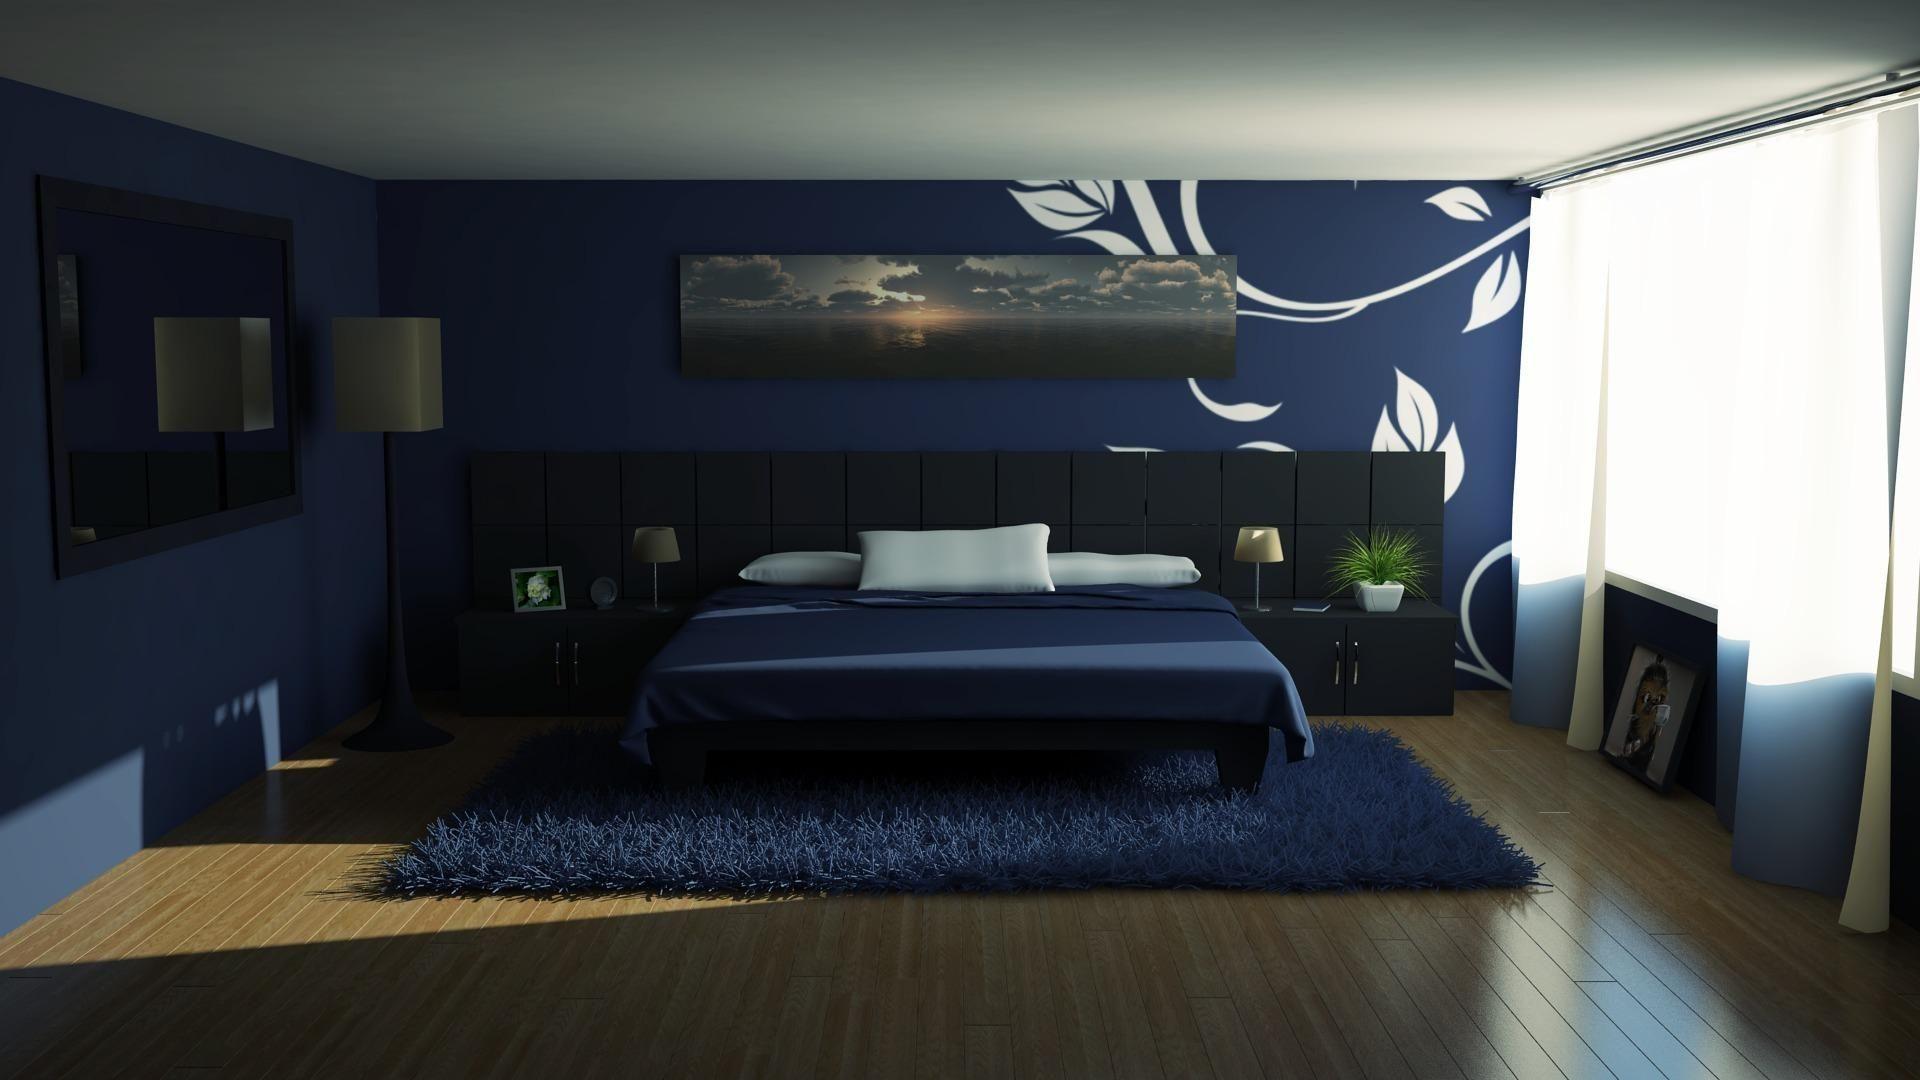 Beautiful Bedroom Design Hd Images Blue Room Decor Bedroom Blue Bedroom Blue Bedroom Decor